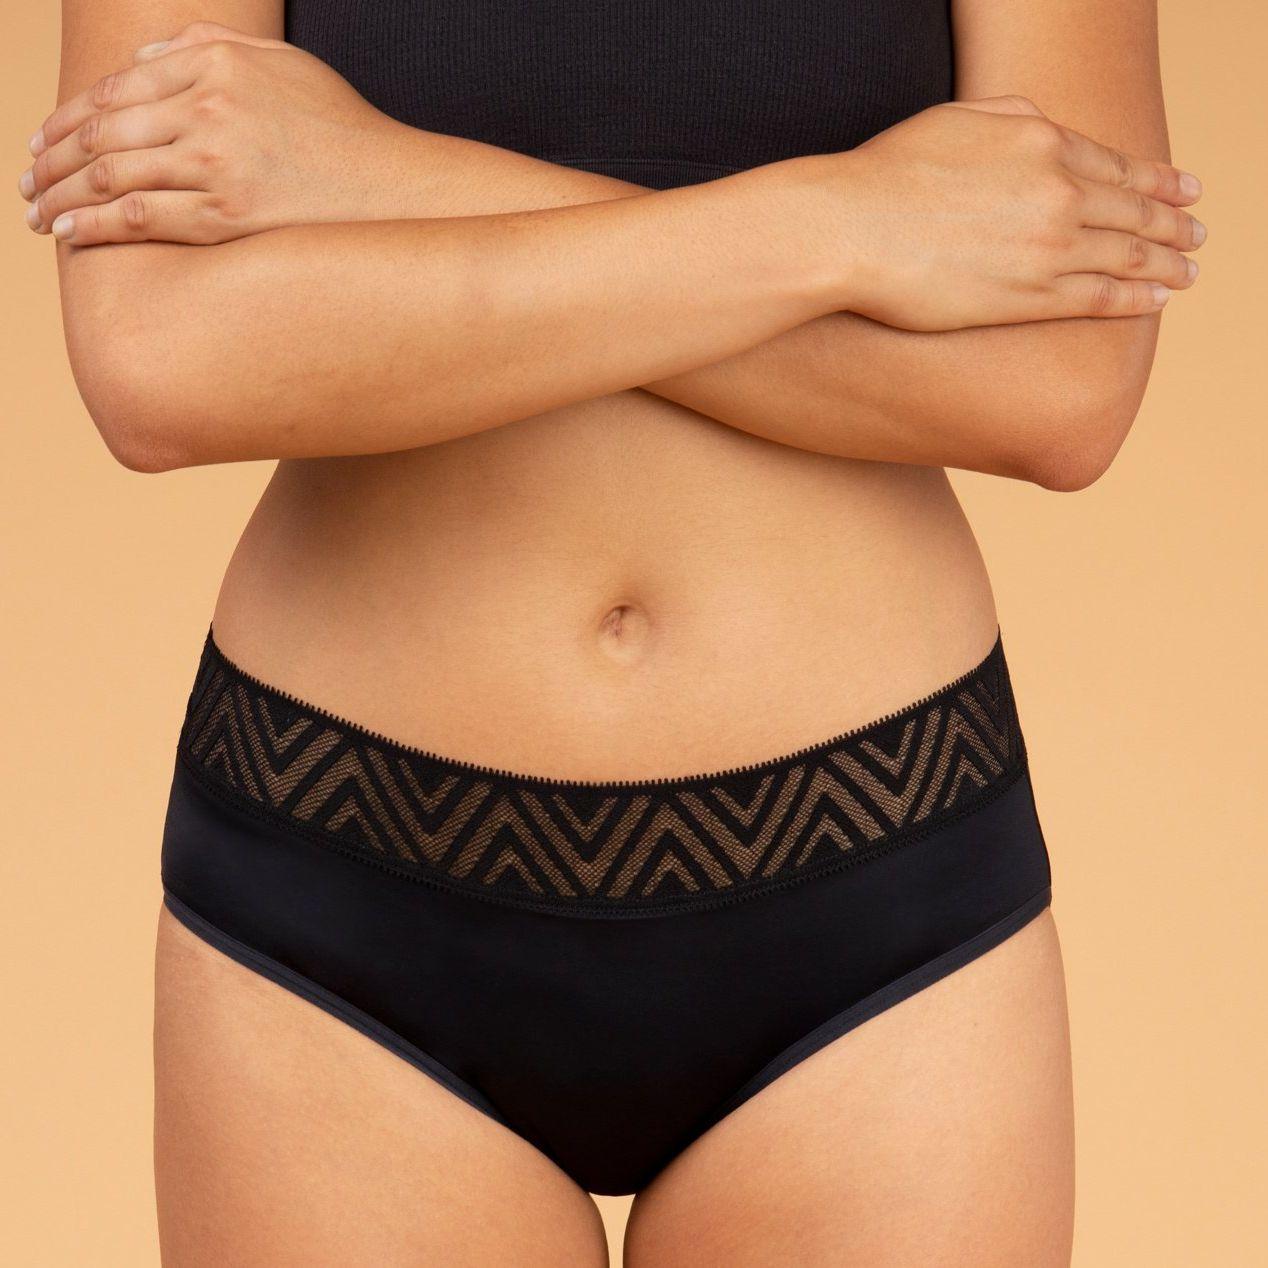 The 8 Best Period Panties to Buy in 2018